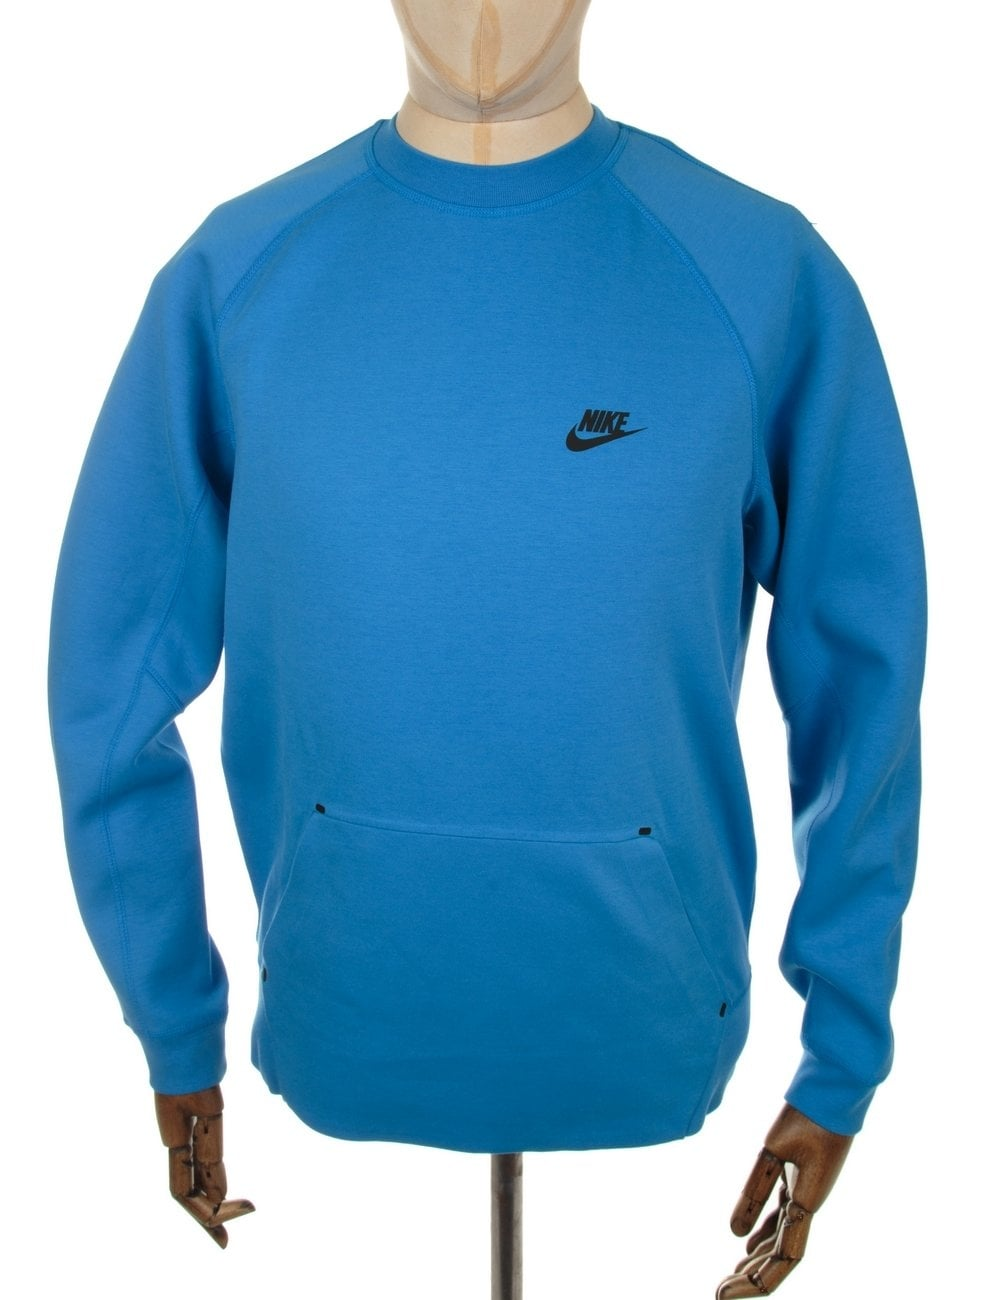 73dc4f053 Nike Tech Fleece Crewneck Sweatshirt - Rift Blue - Clothing from Fat ...